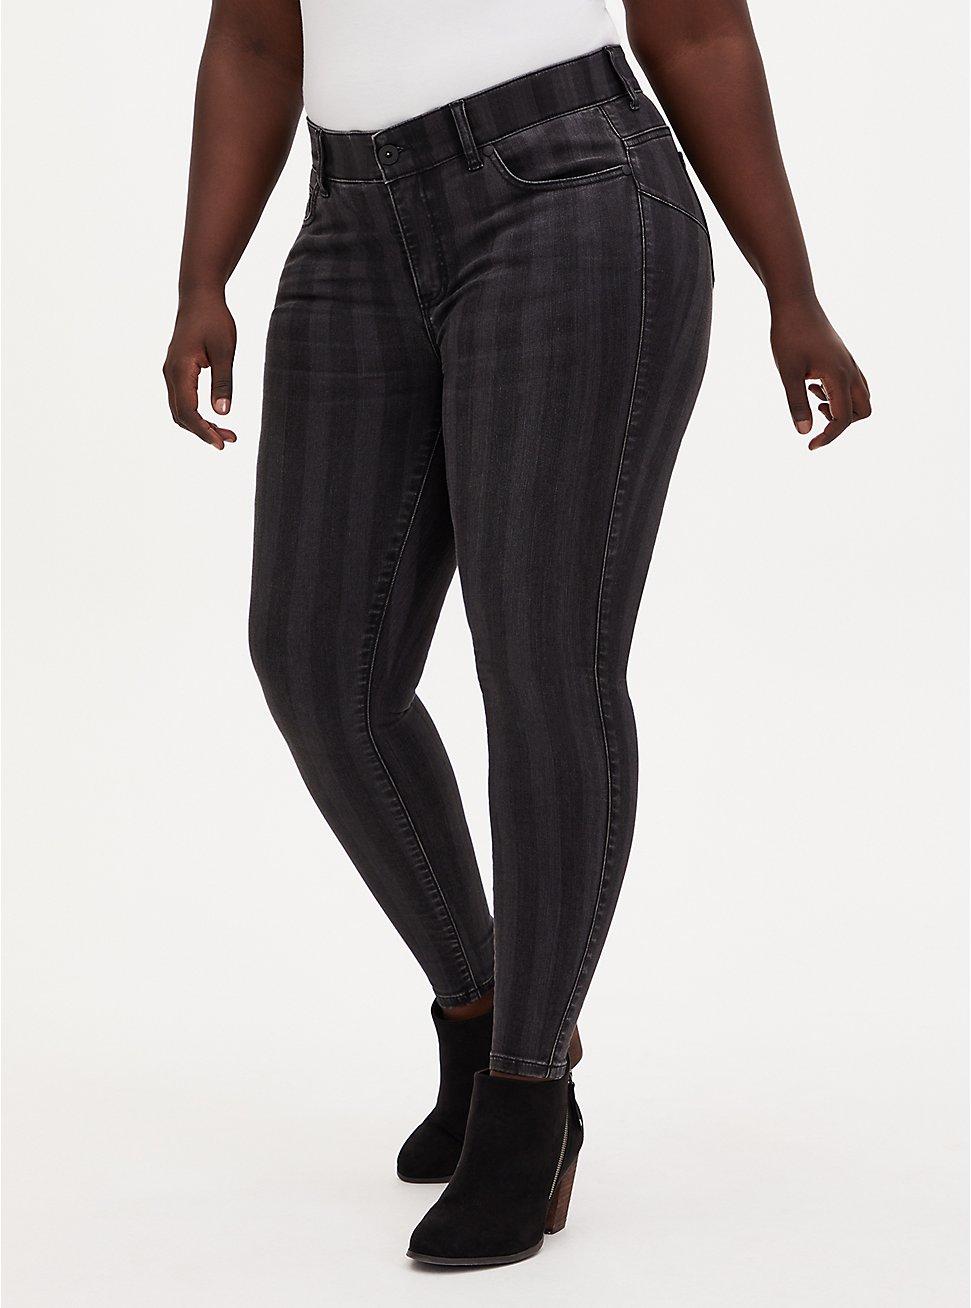 Bombshell Skinny Jean - Super Soft Black Stripe, , fitModel1-hires